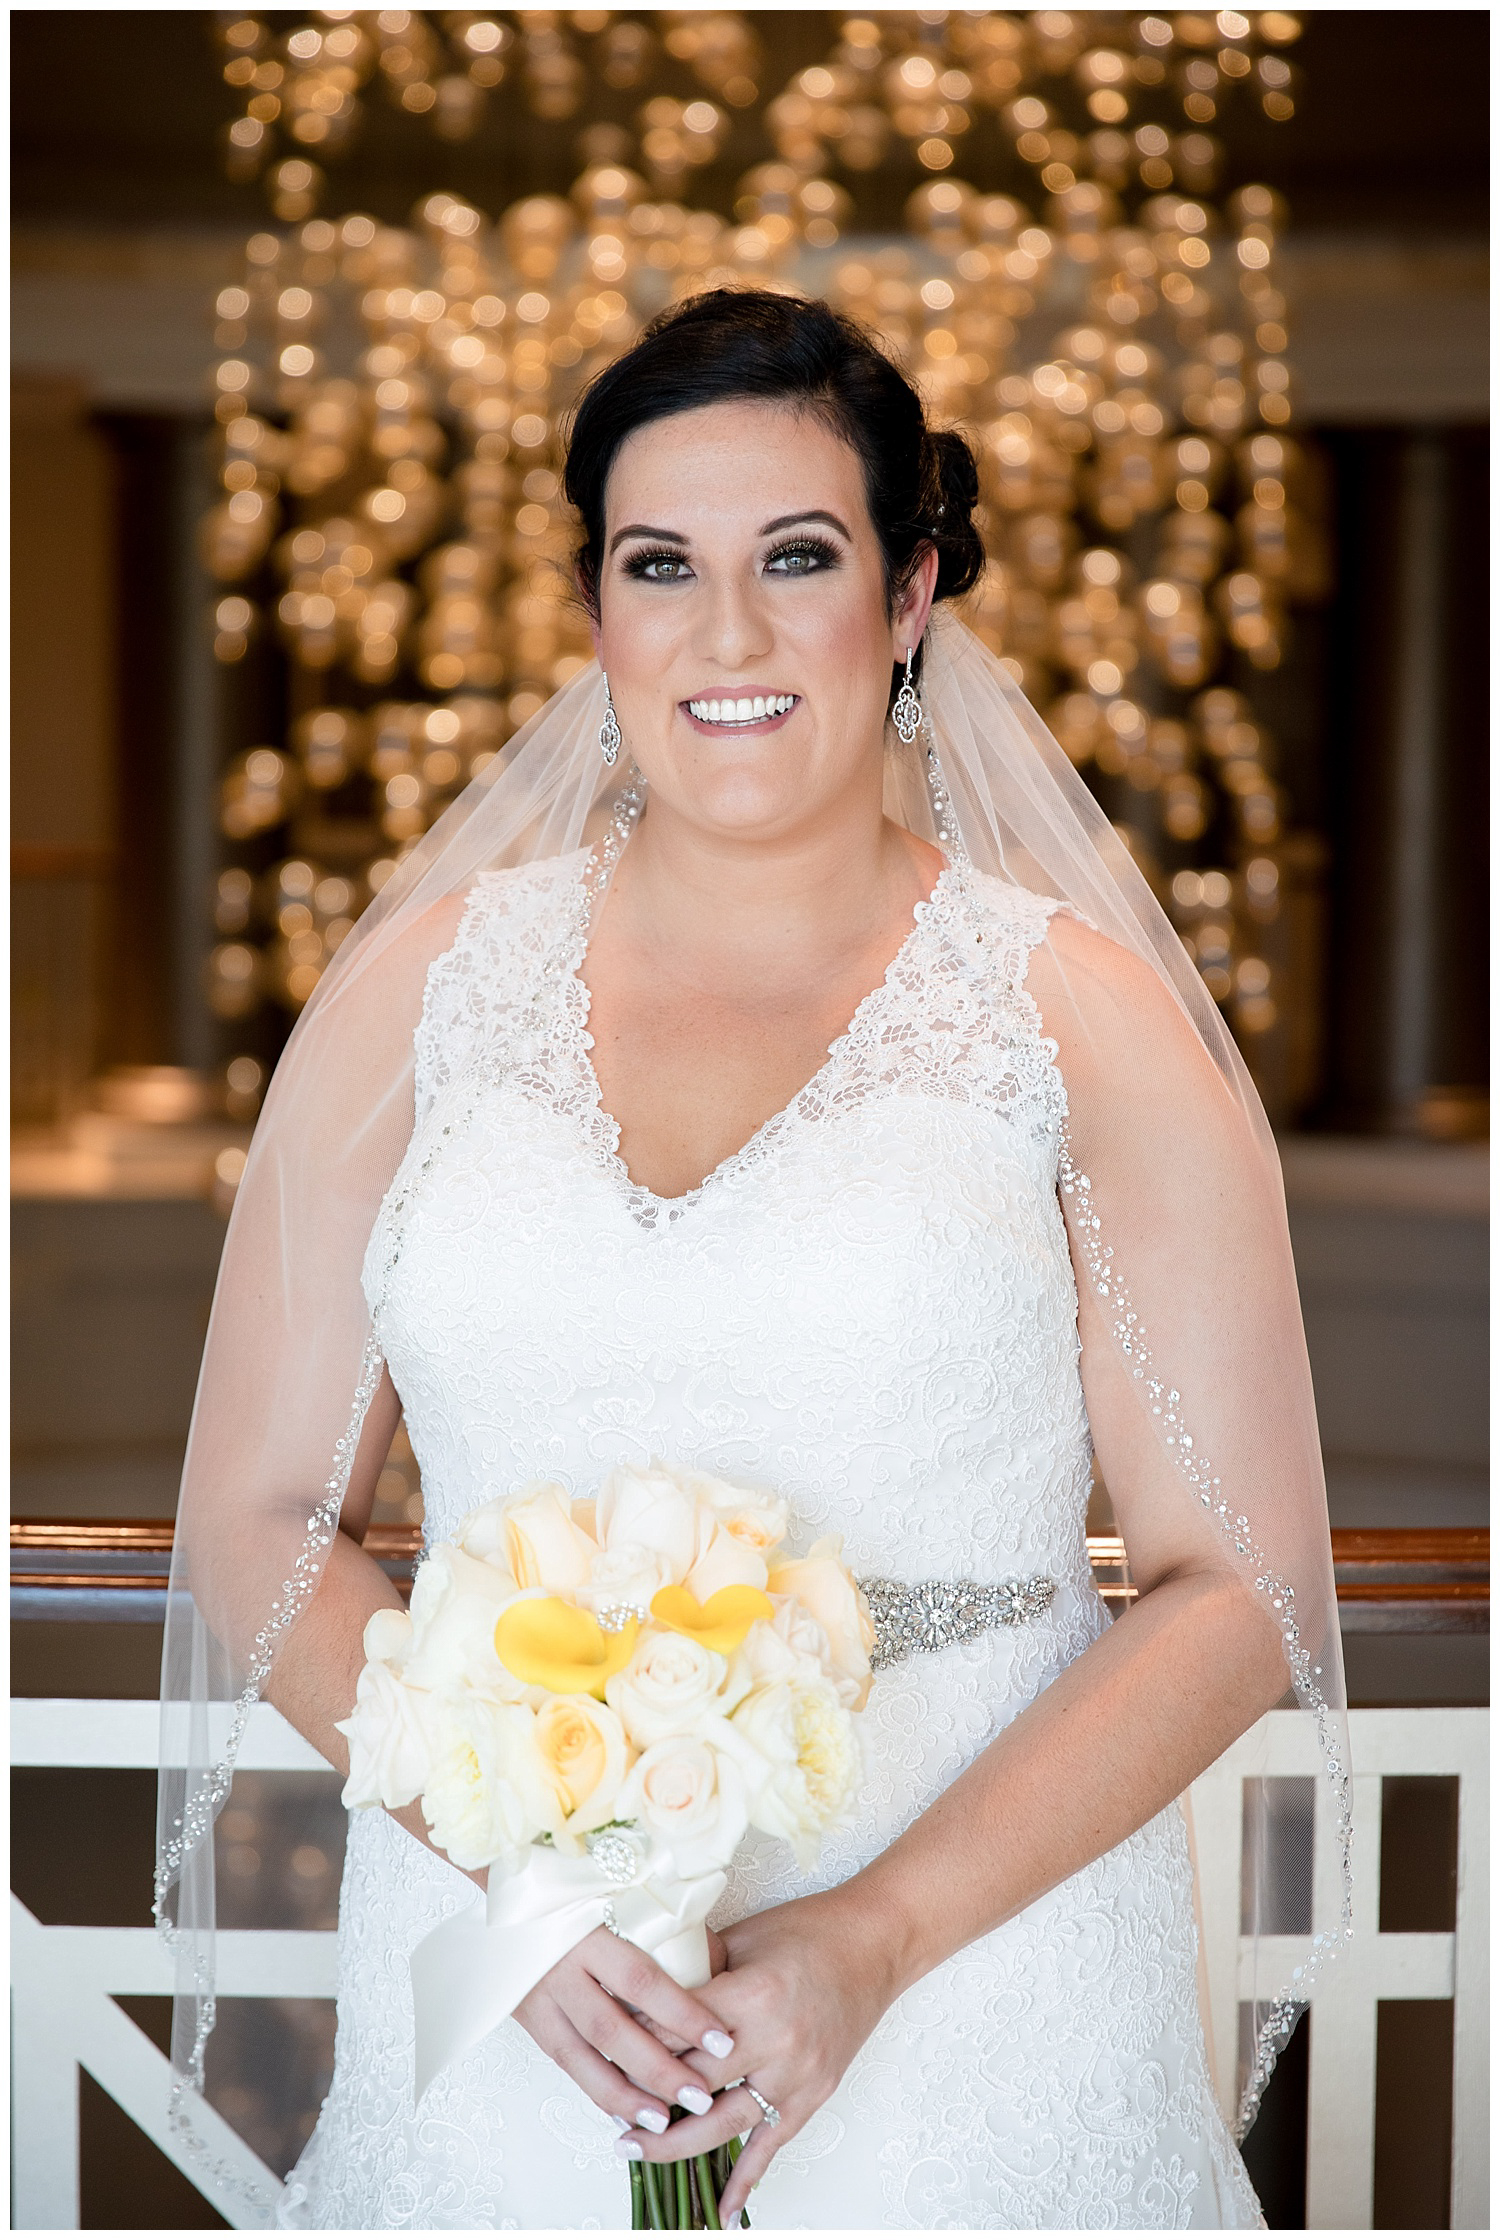 Hillside-Country-Club-Wedding-Photography-26-North-Studios-011.j